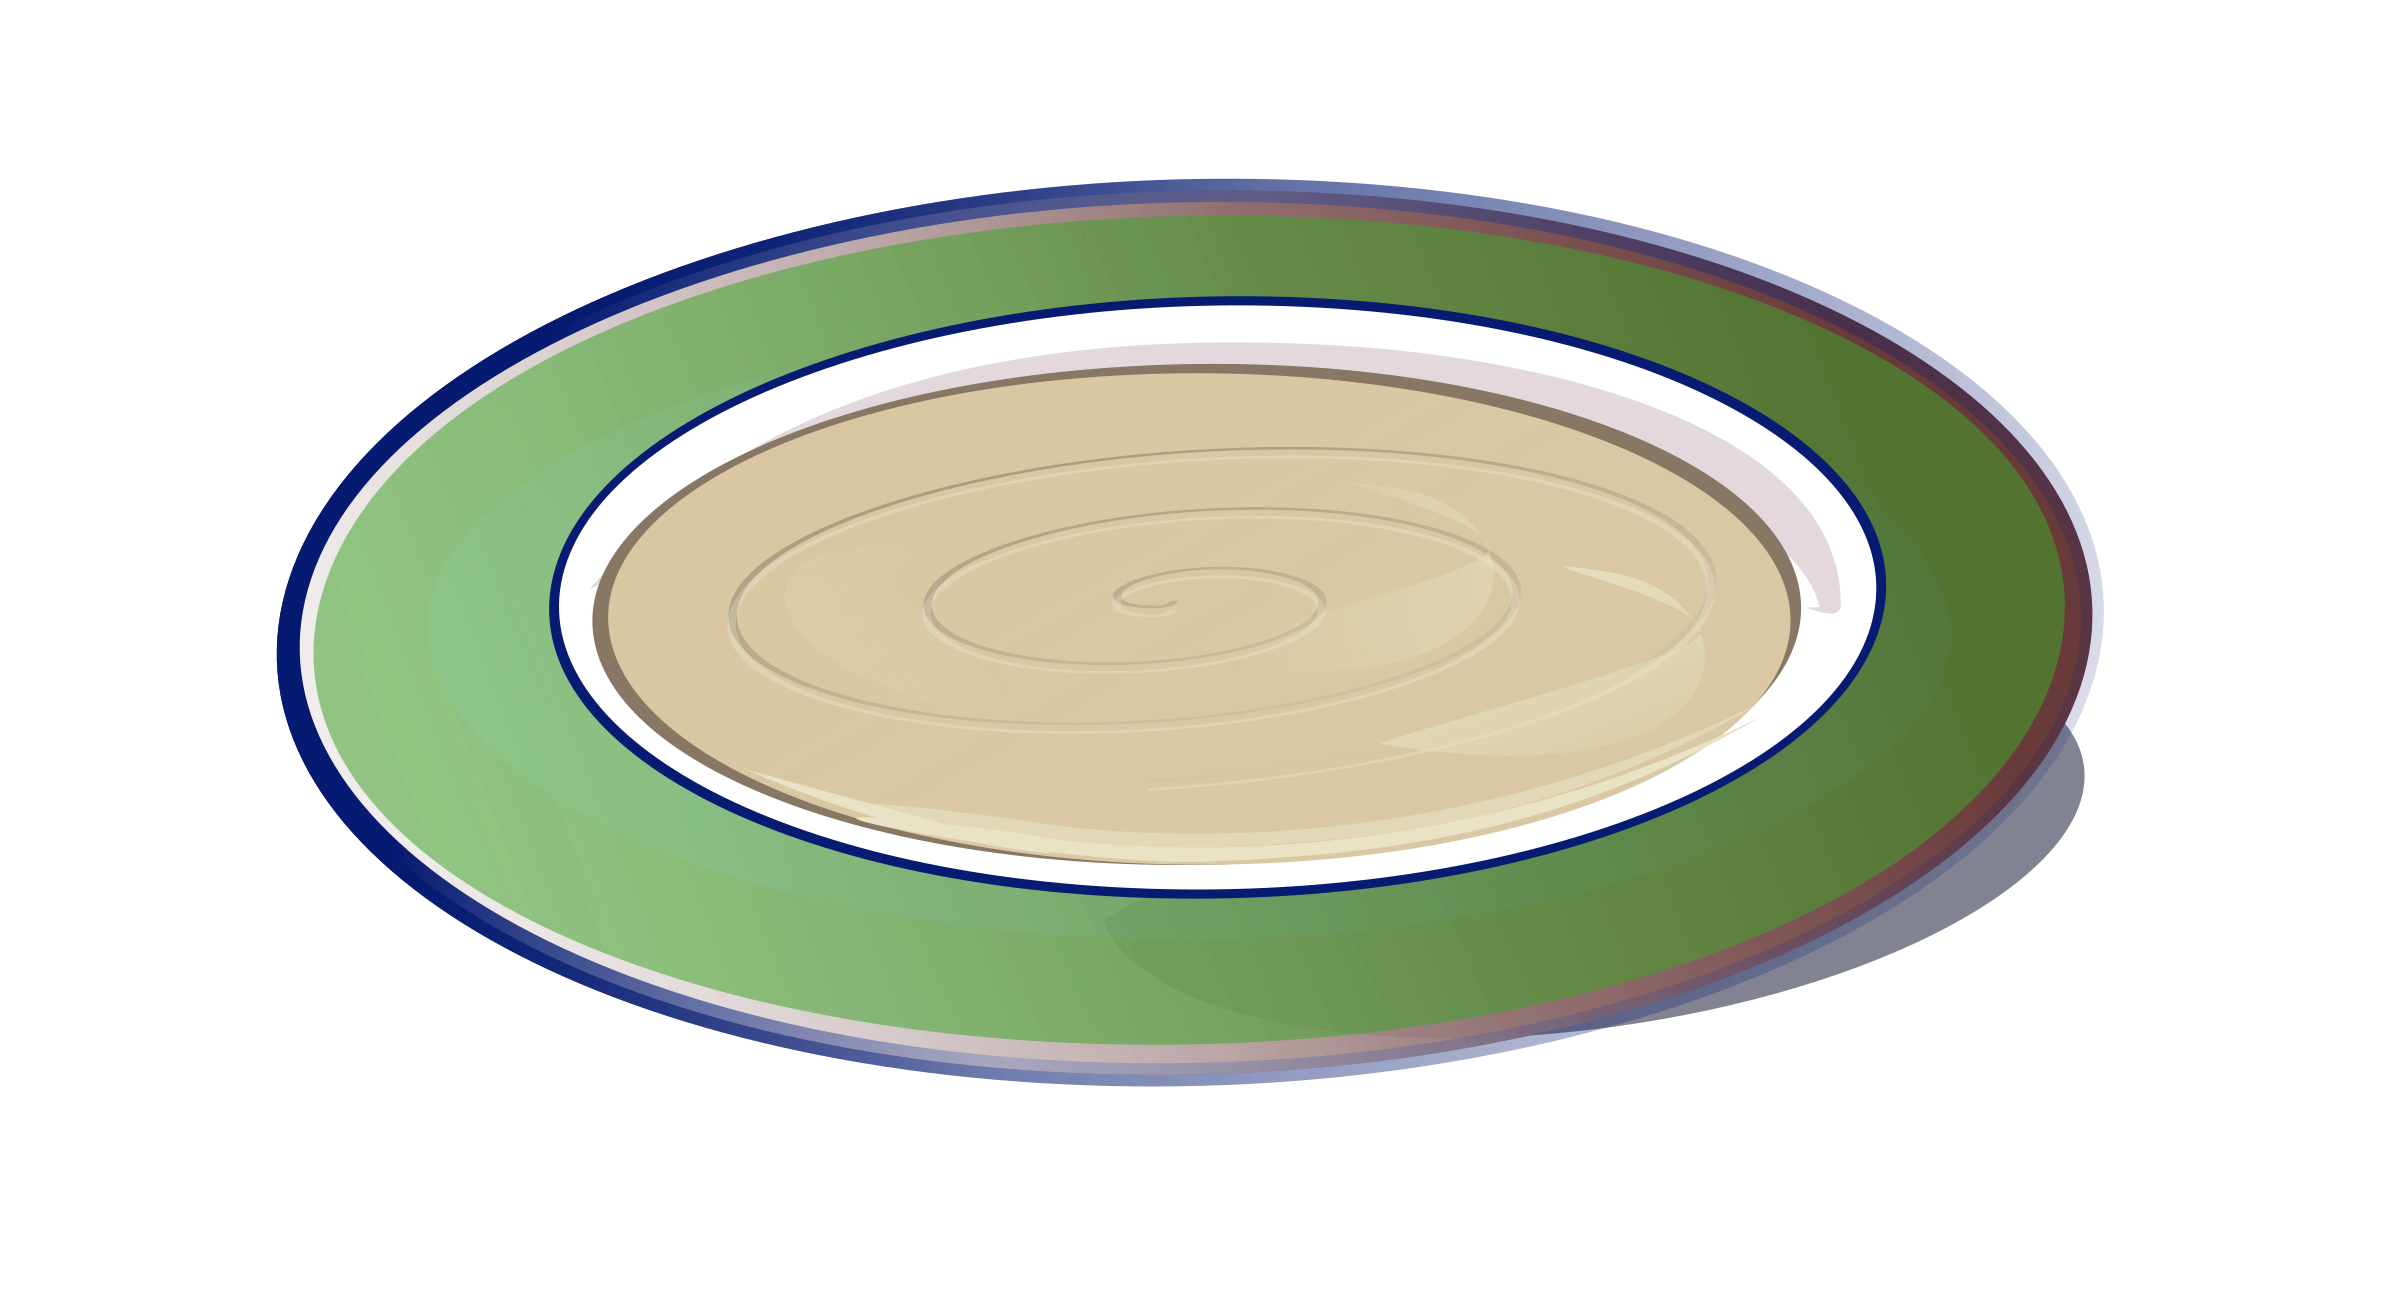 Hummus clipart jpg free stock Hummus PNG images free download jpg free stock